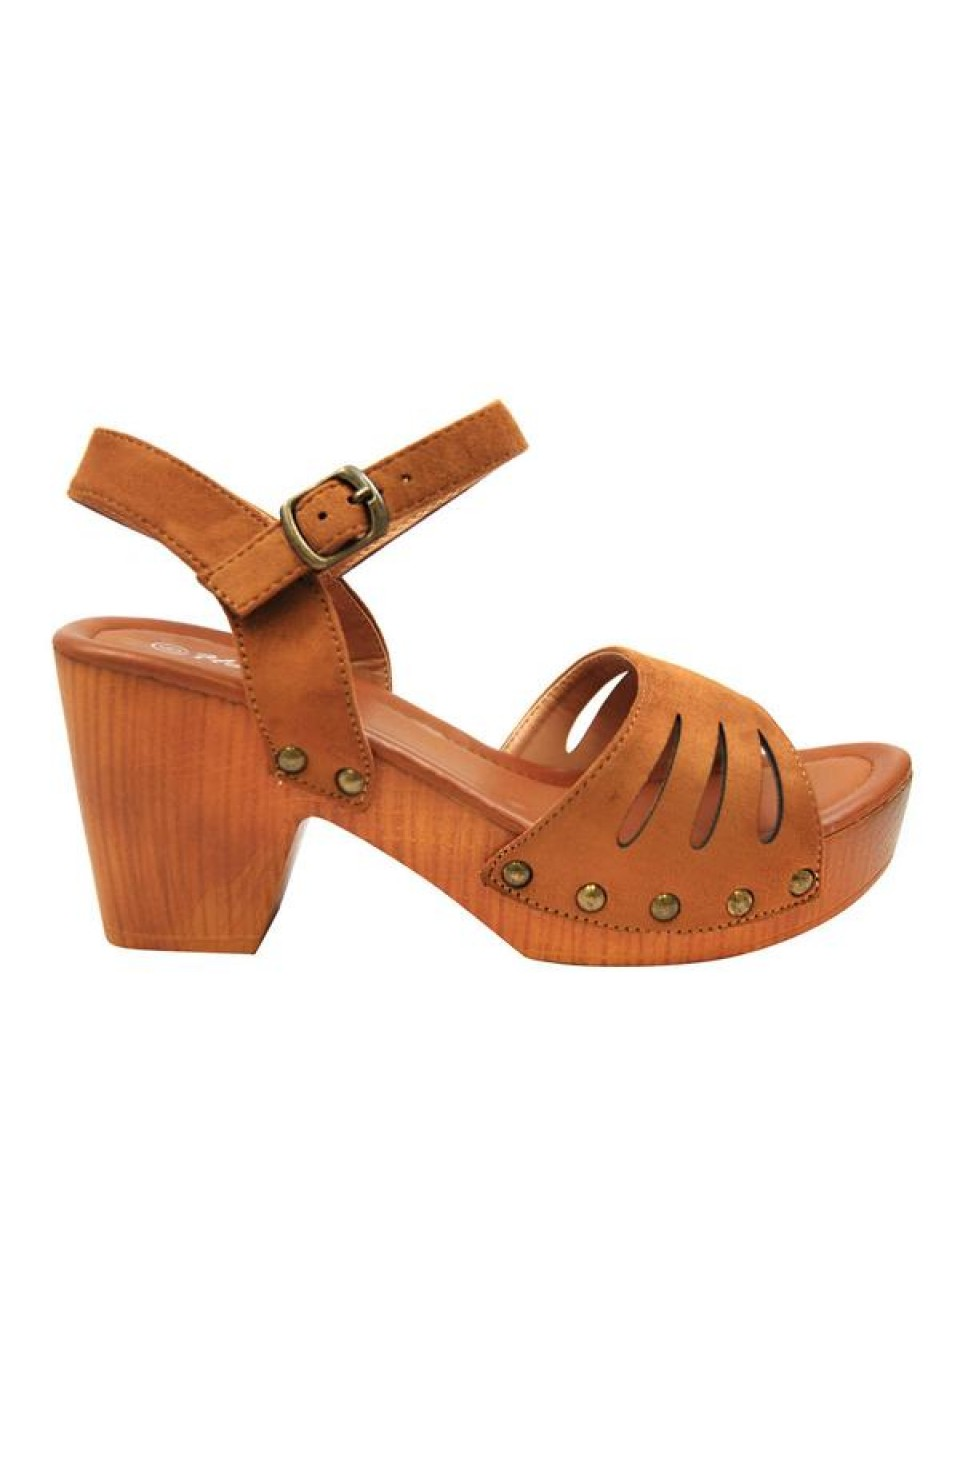 Women's Cognac Manmade Karrey 3-inch Heeled Sandal with Silver Studs